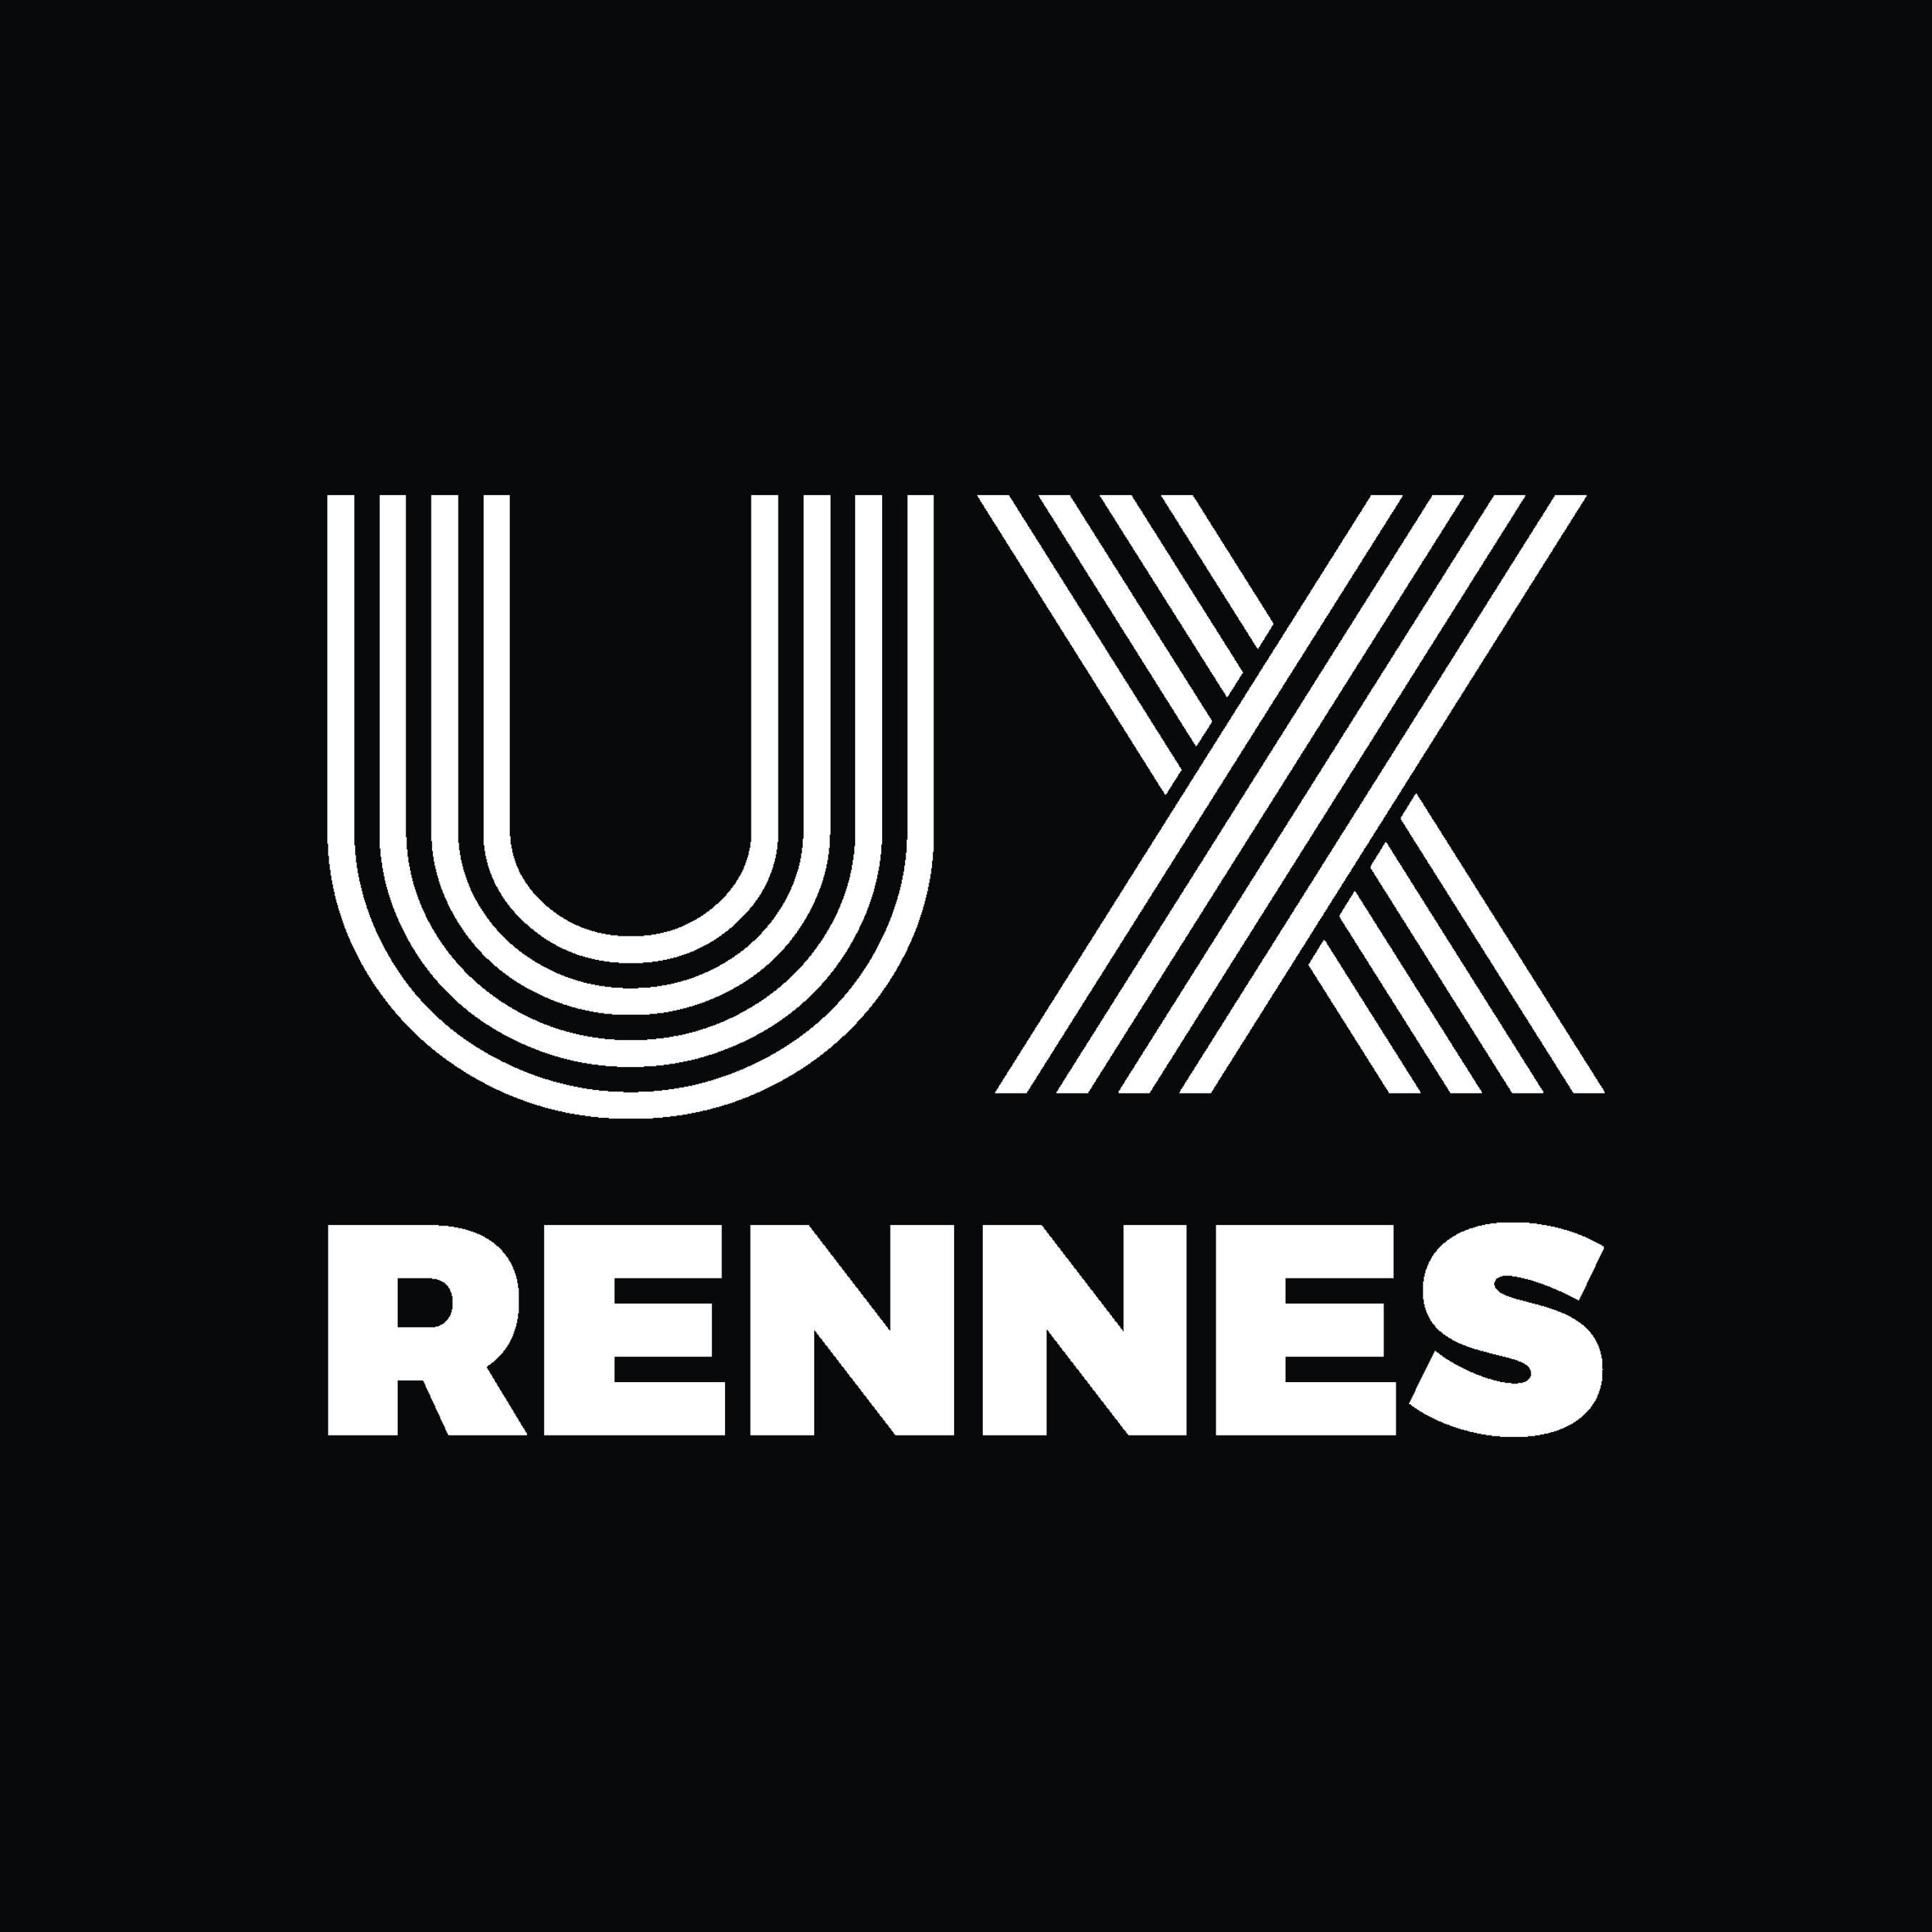 UX Rennes